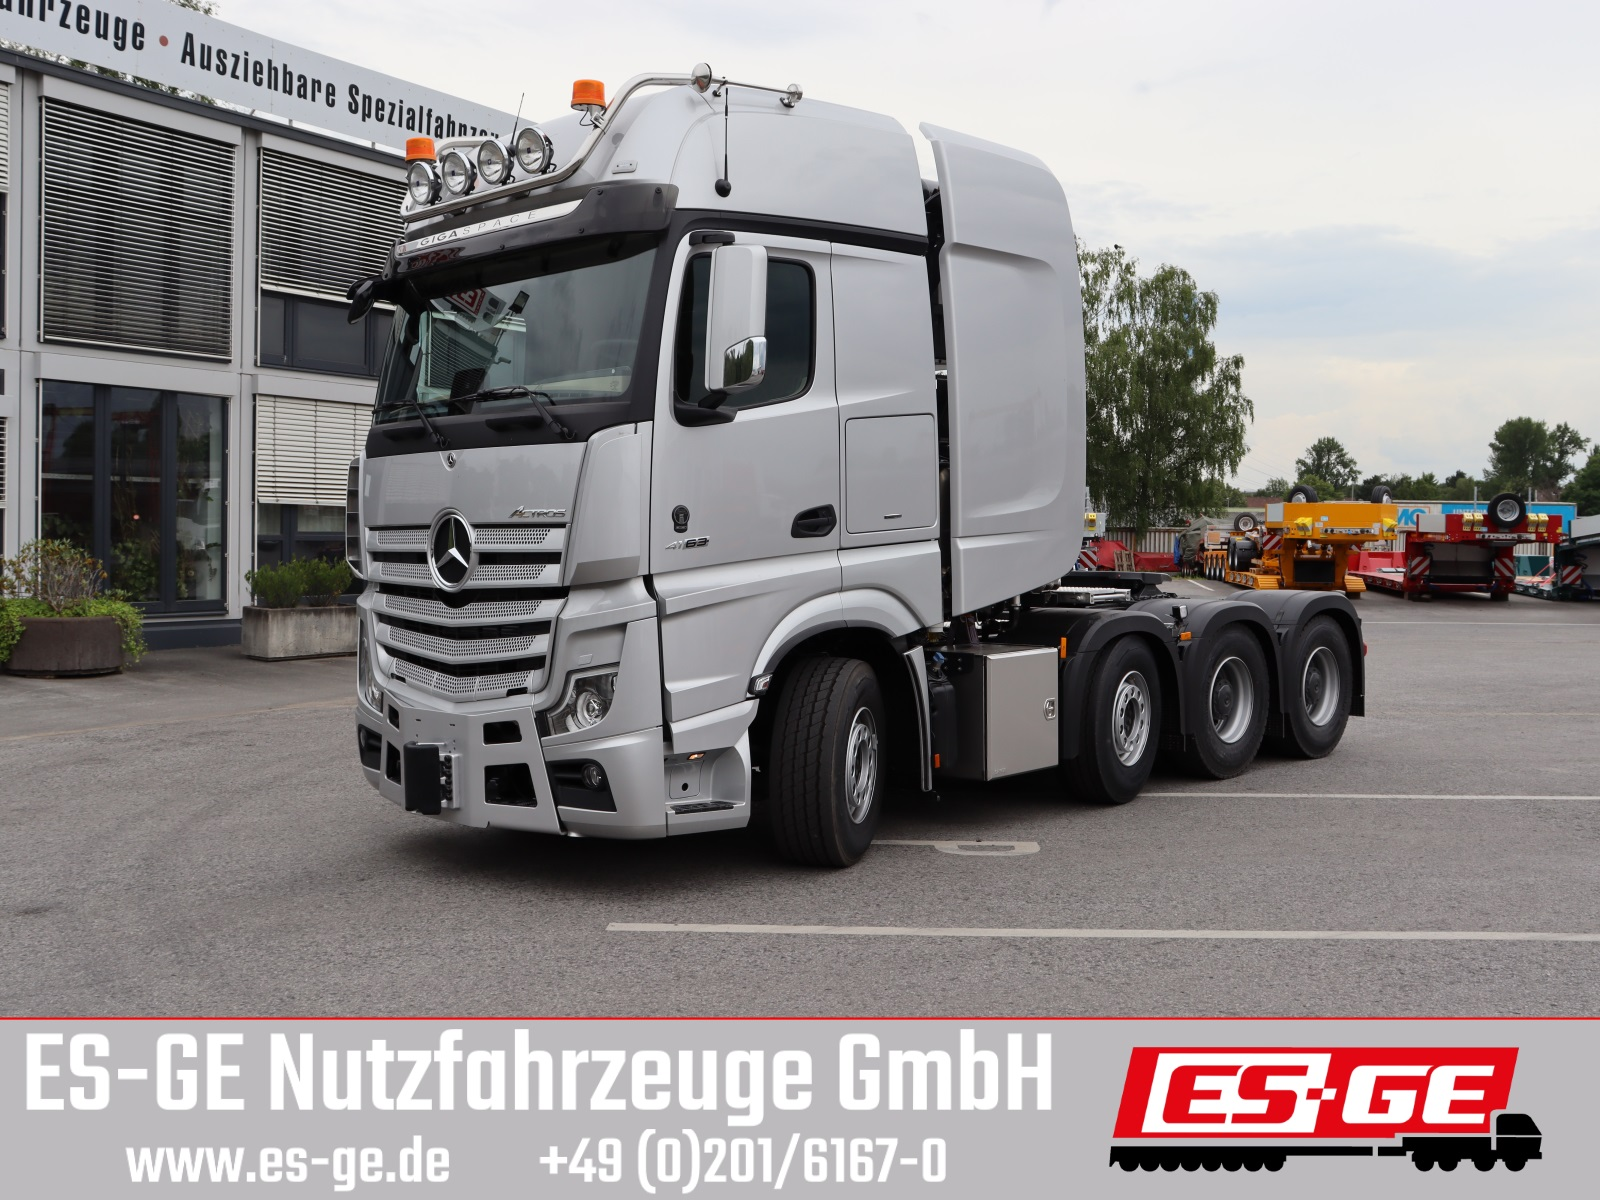 Mercedes-Benz Actros 4163 LS 8x4 (250 t ZGG)